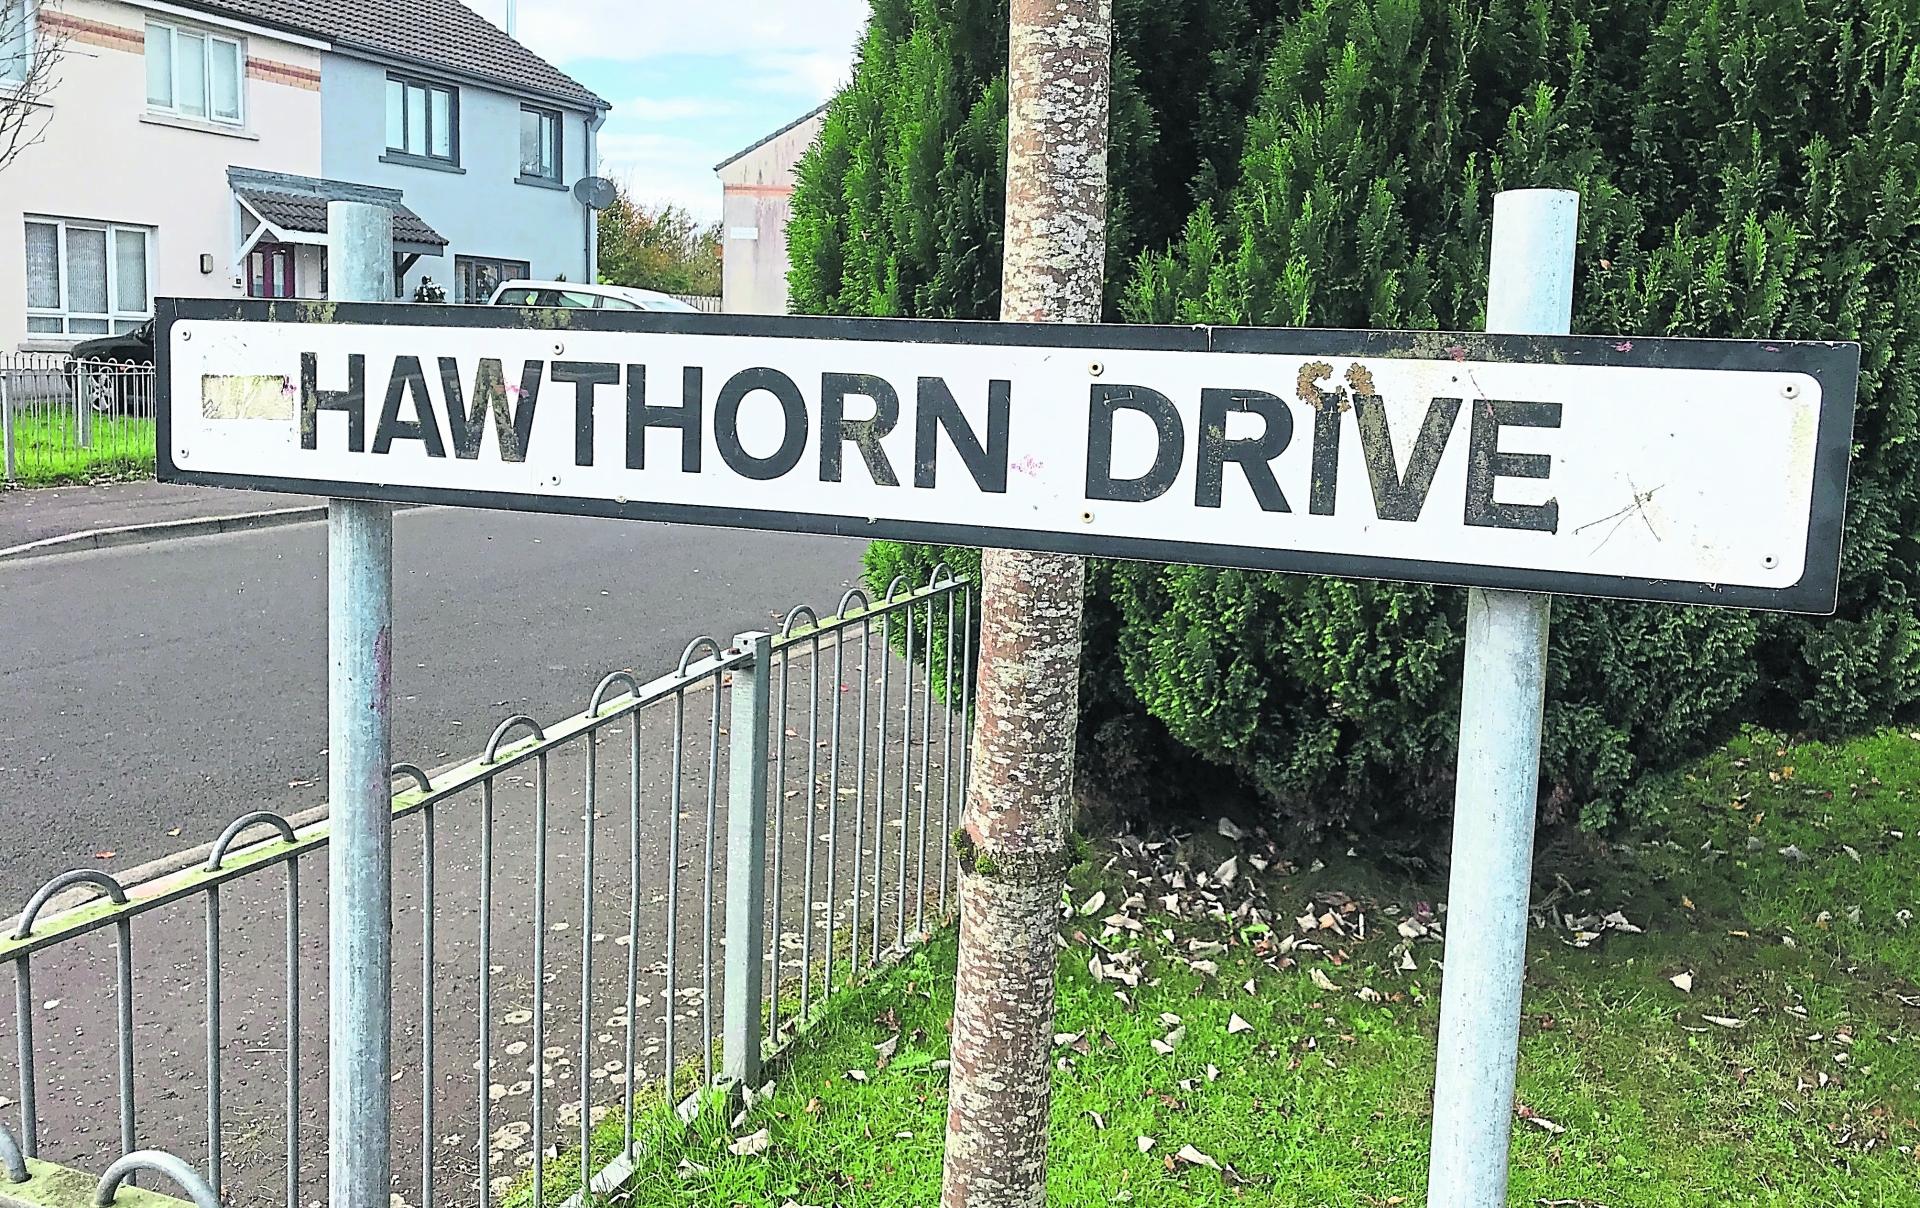 Hawthorn Drive, Derry